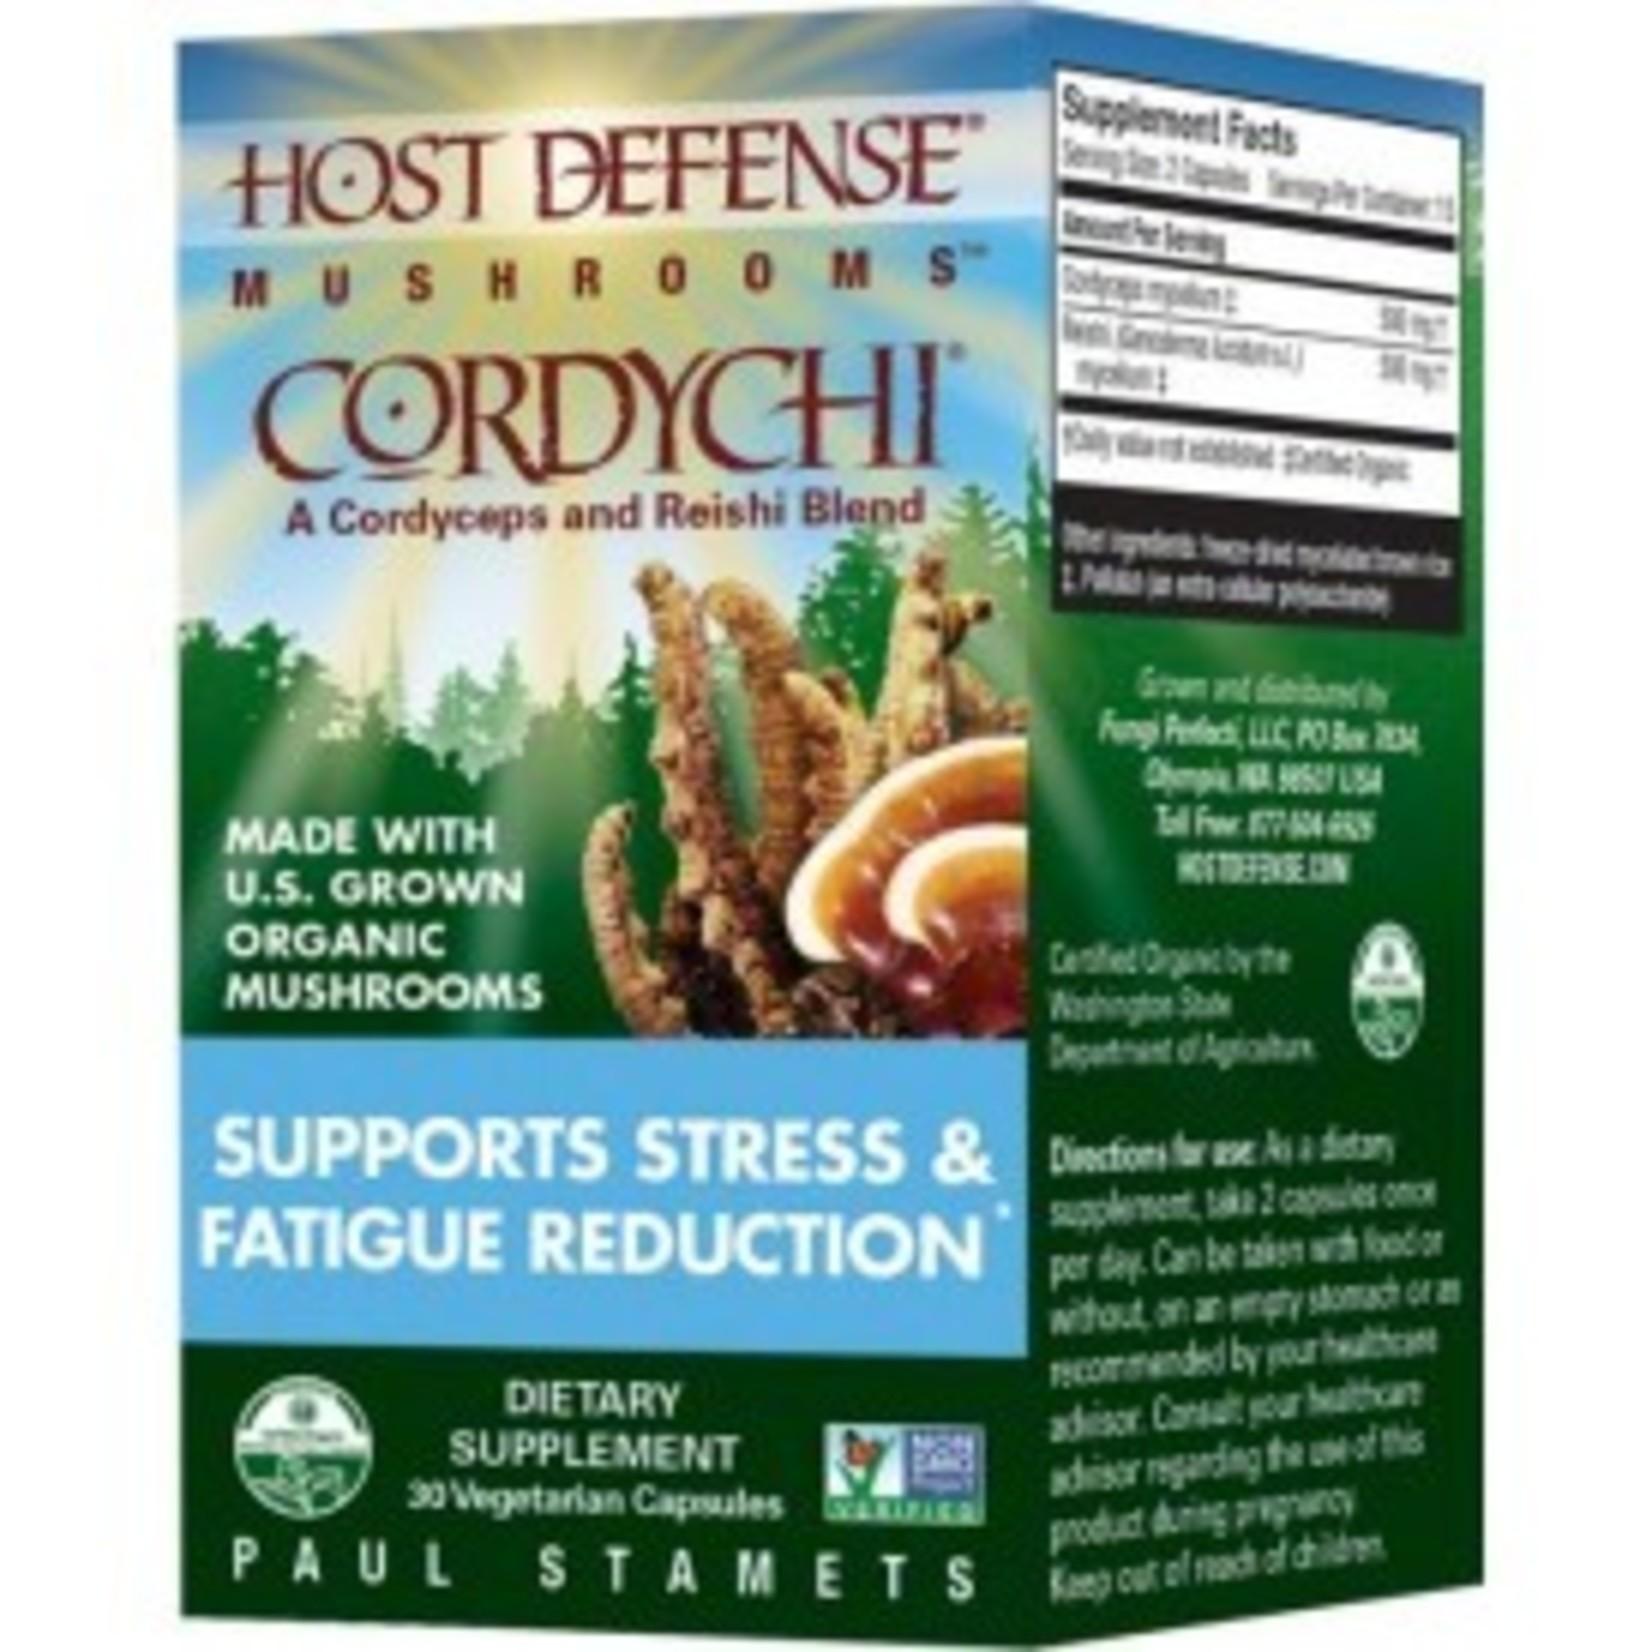 Host Defense Host Defense Cordychi - Cordyceps and Reishi 30caps